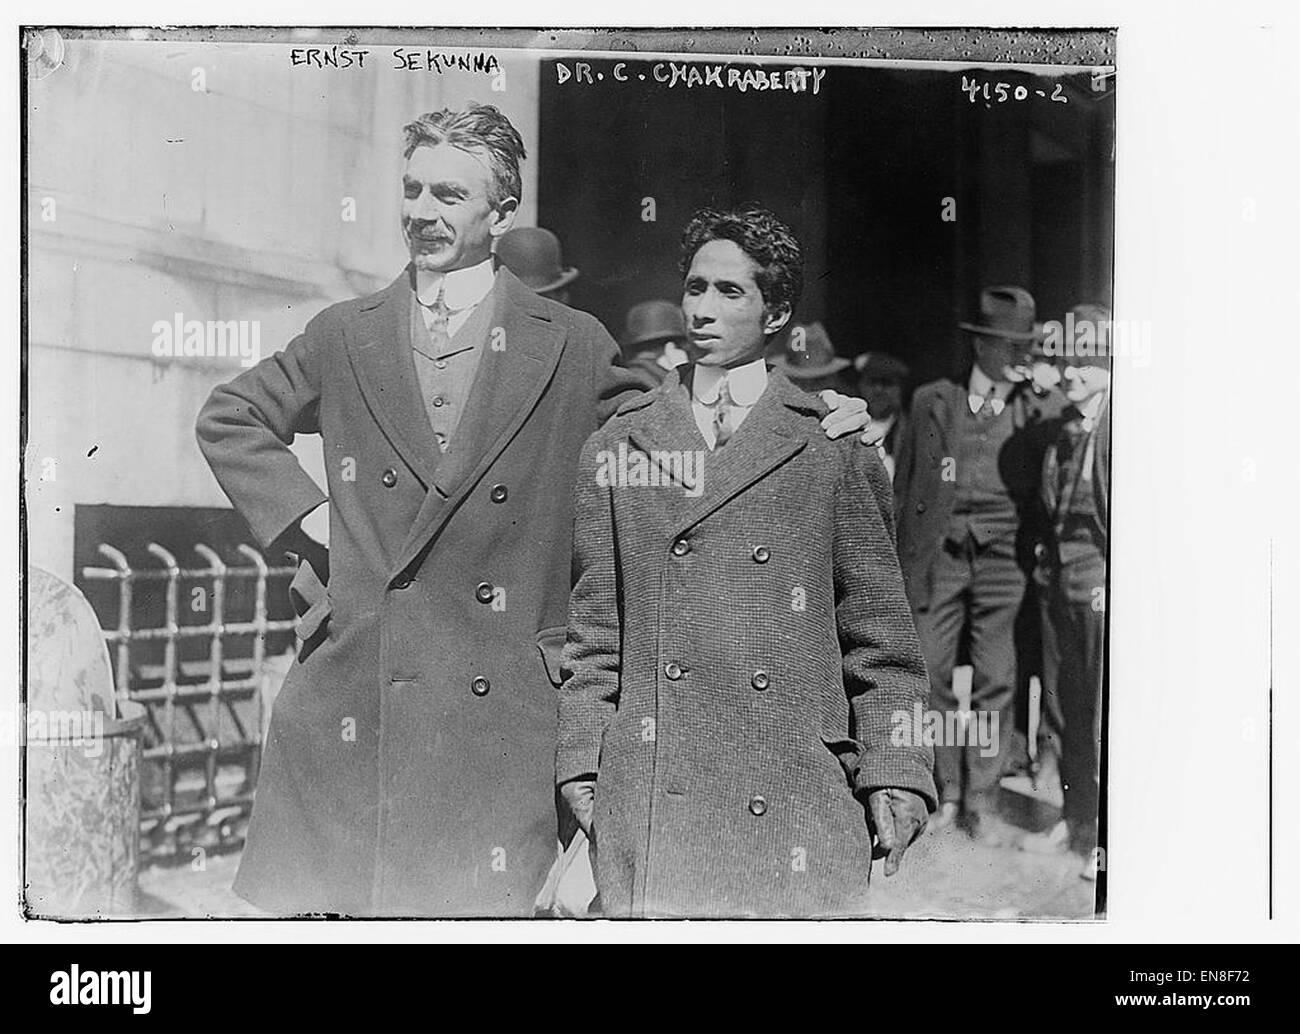 Ernst Sekunna & Chandra Charkraberty - Stock Image